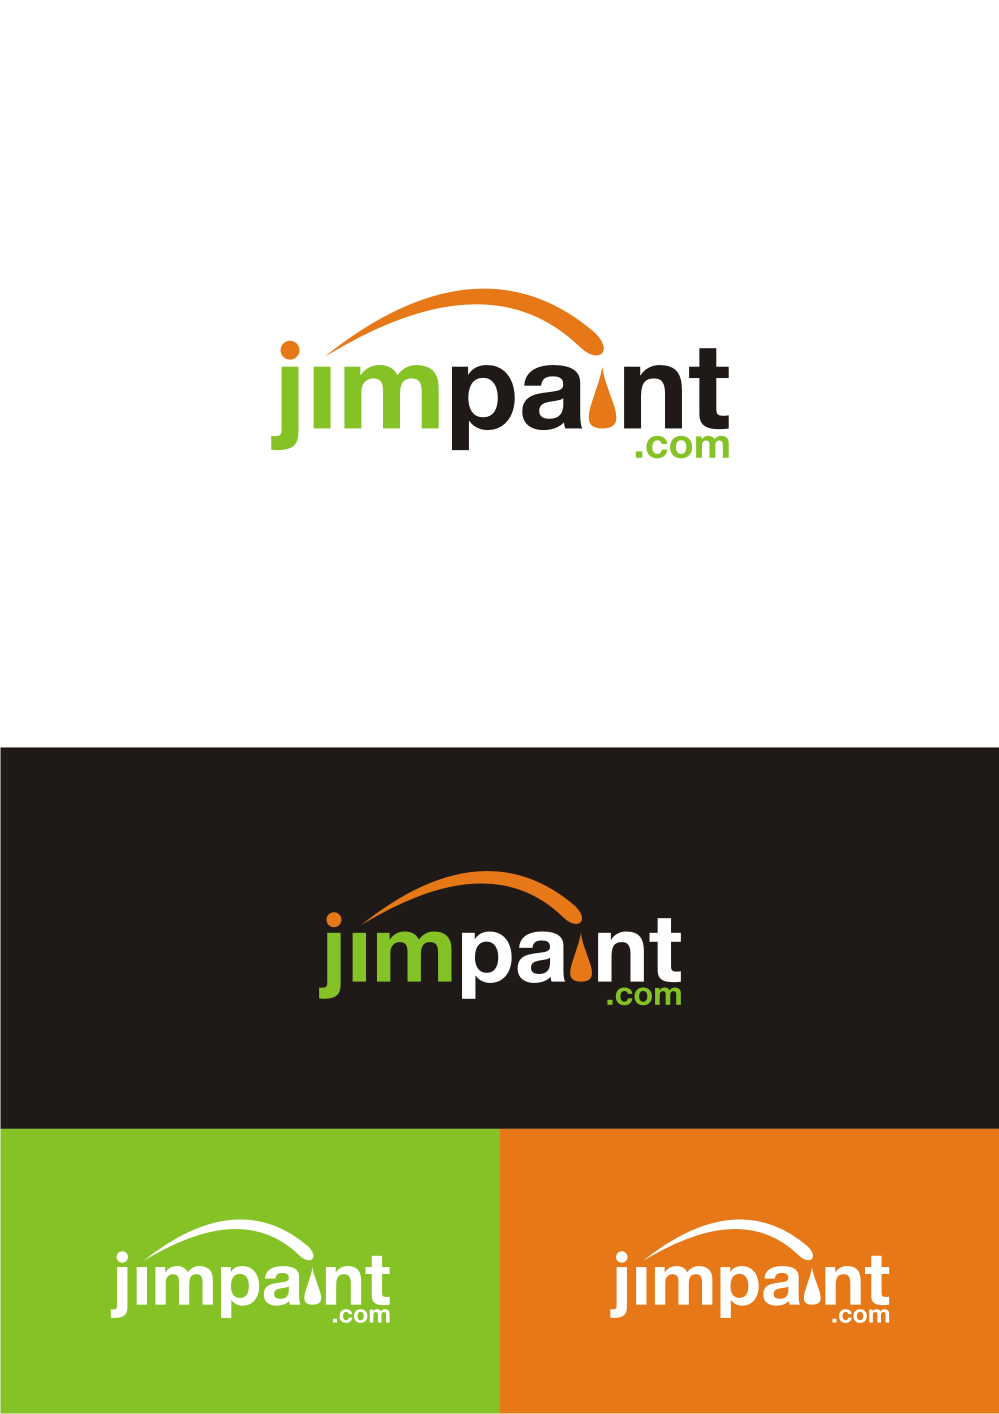 logo for jimpaint.com